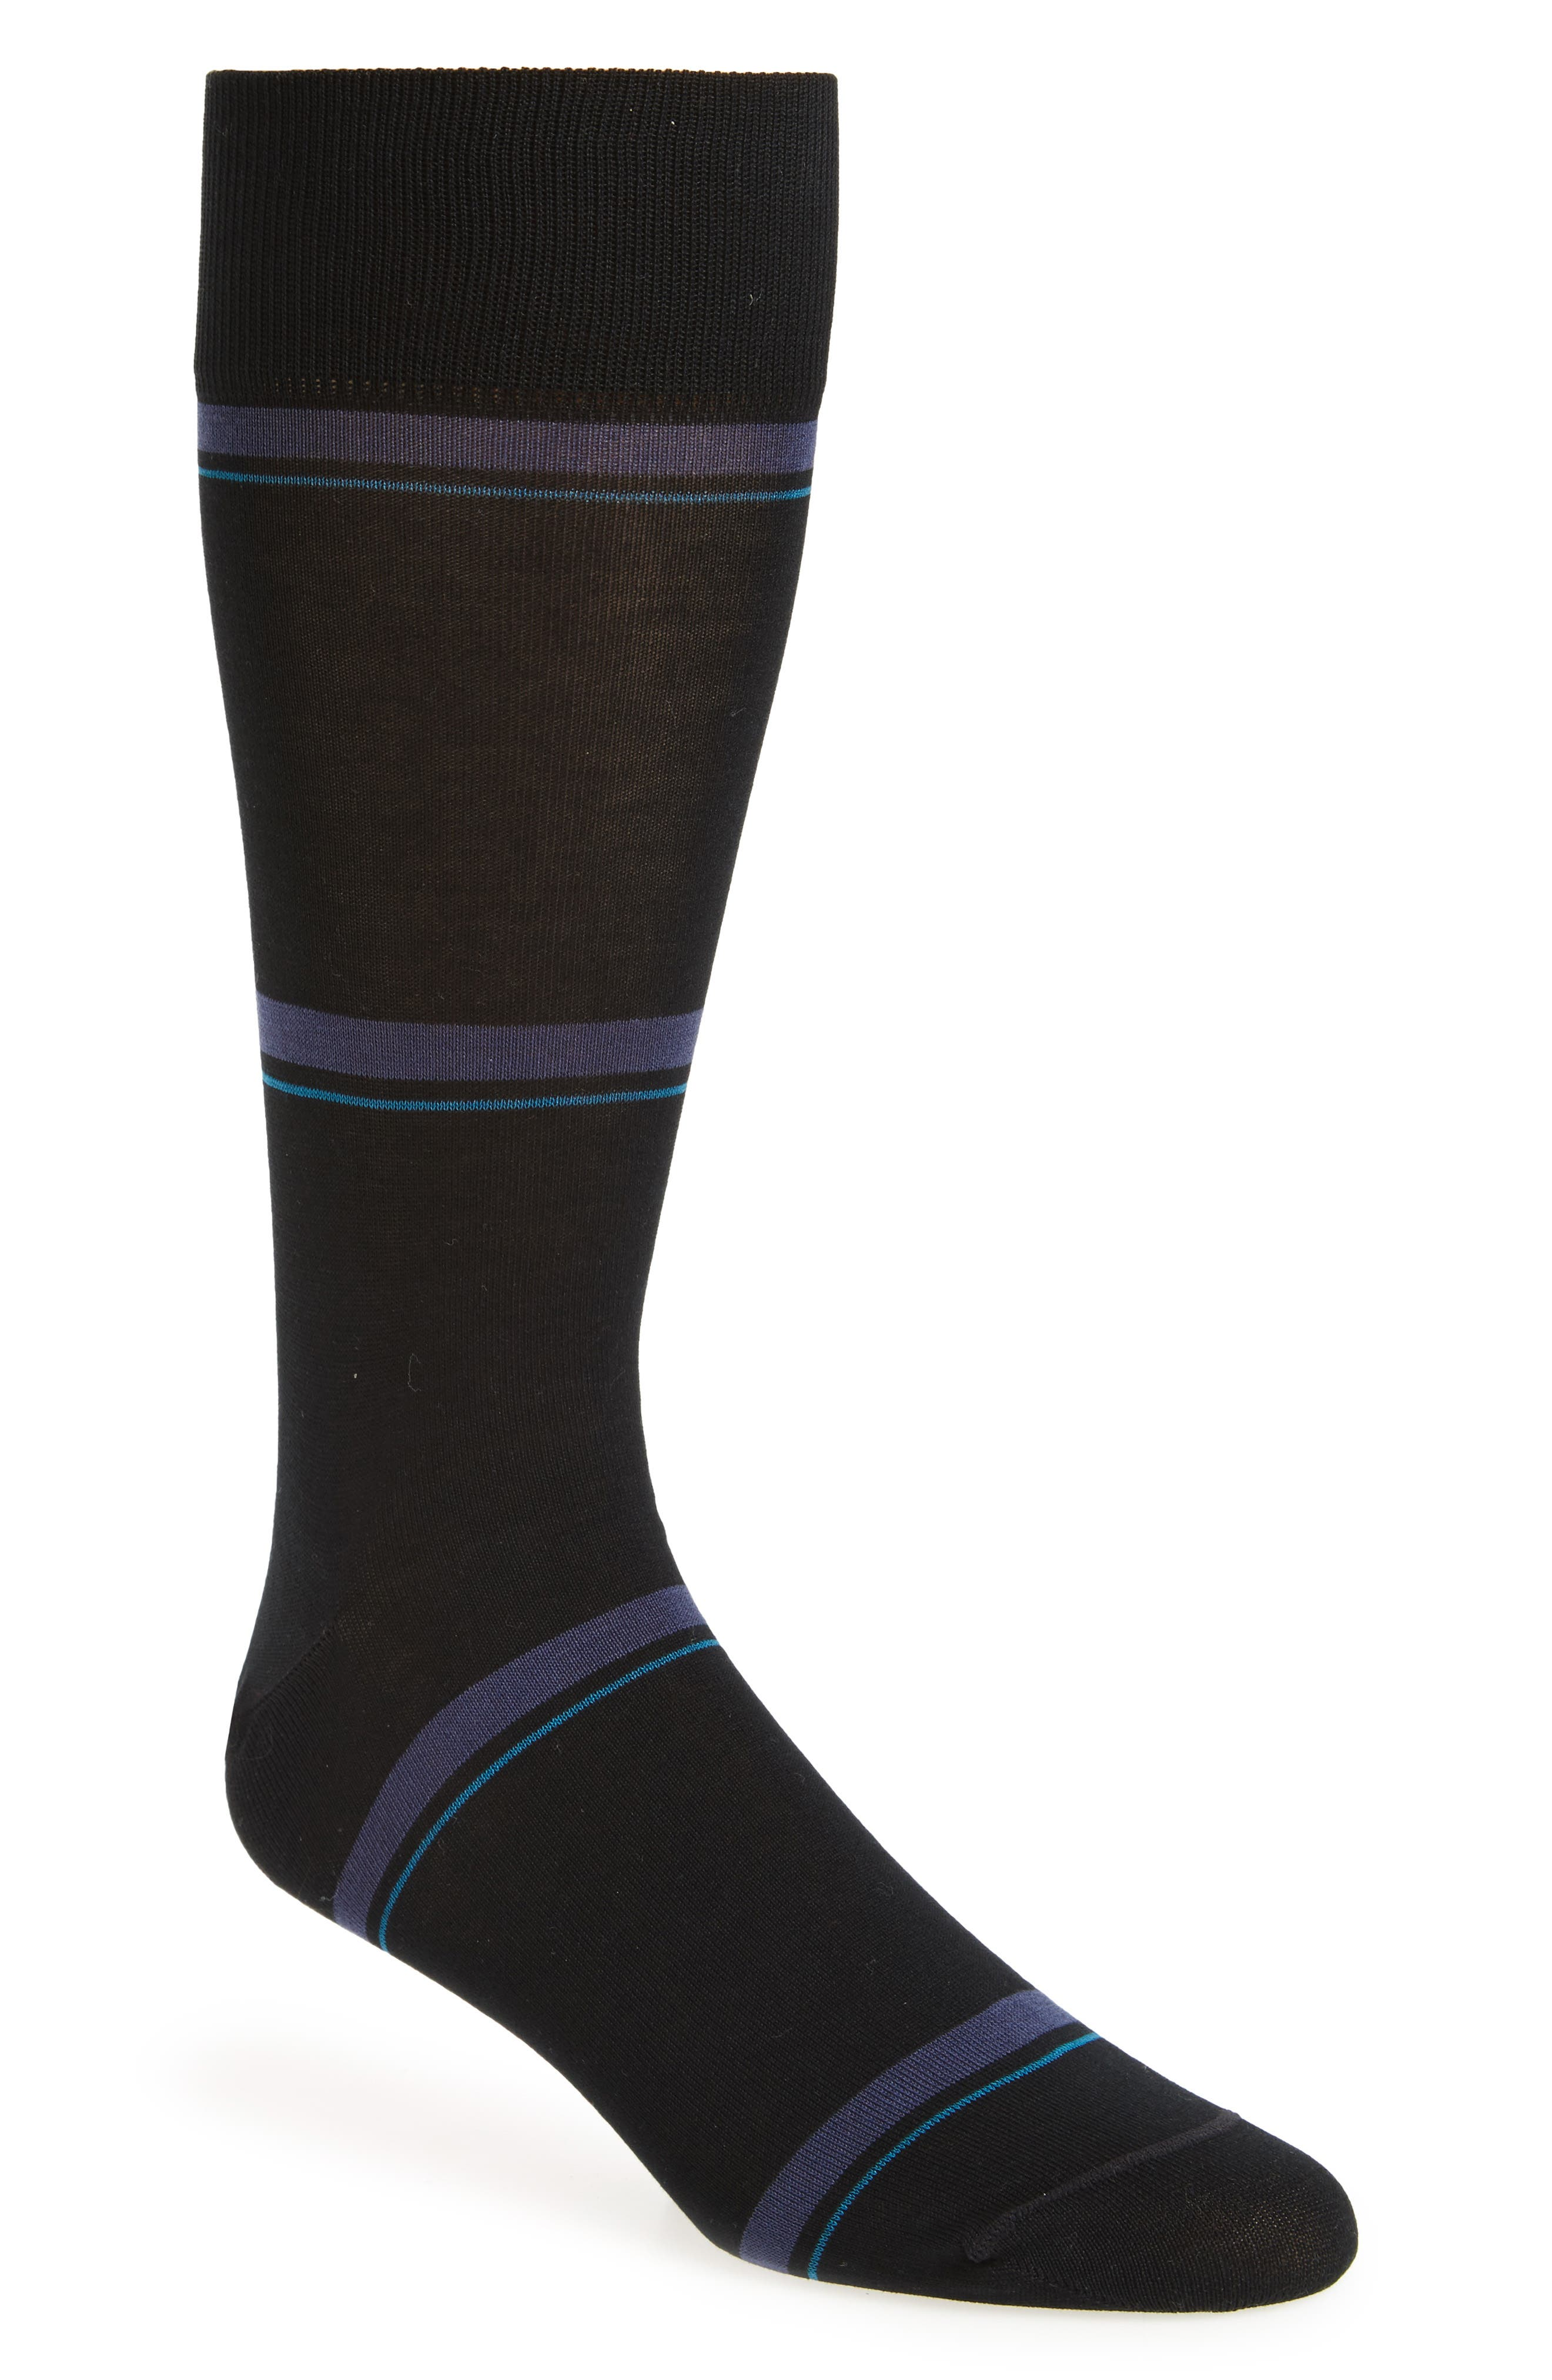 Double Banded Socks,                             Main thumbnail 1, color,                             001